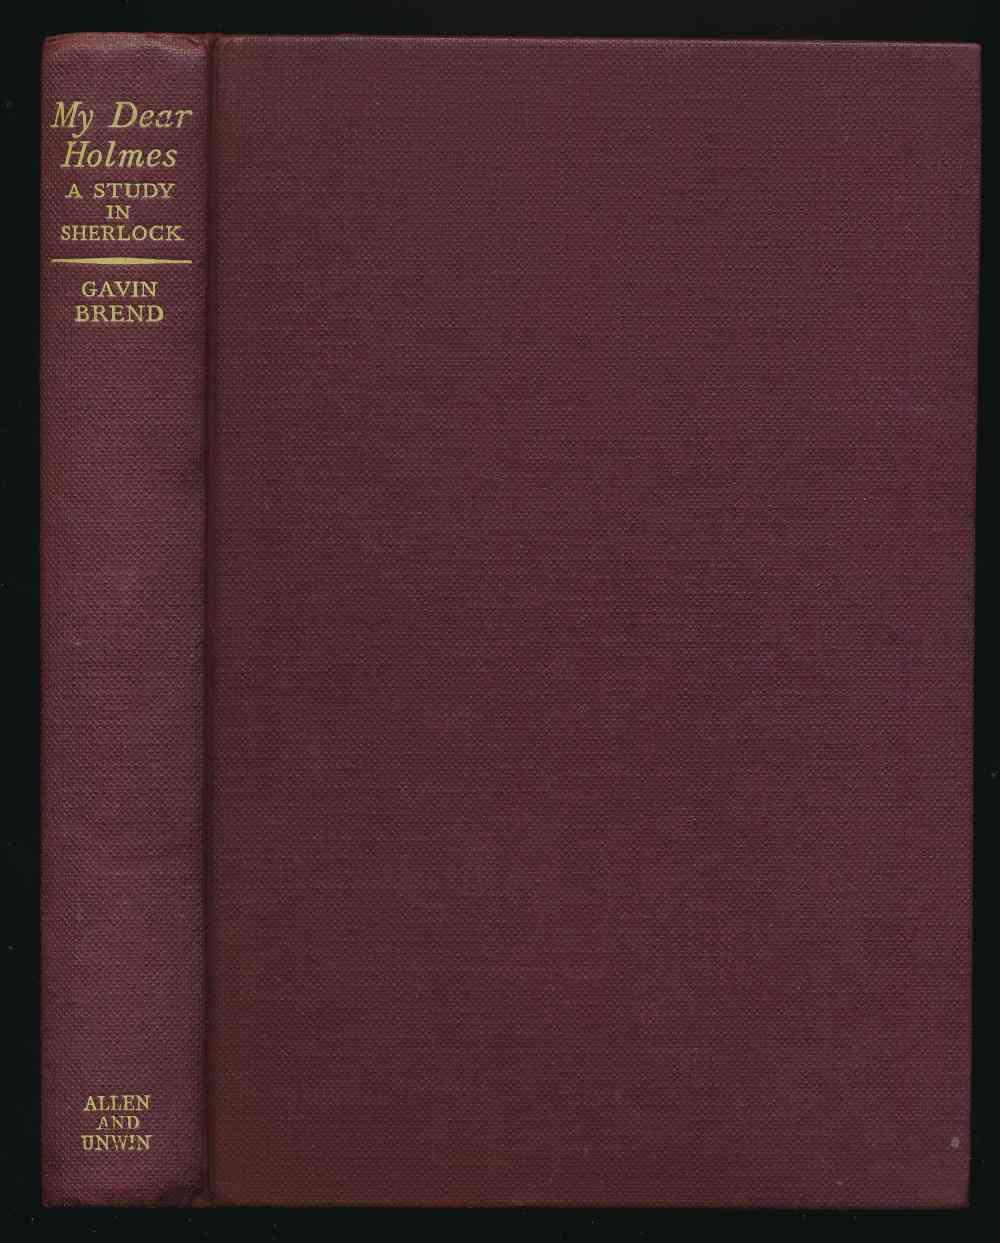 My dear Holmes : a study in Sherlock